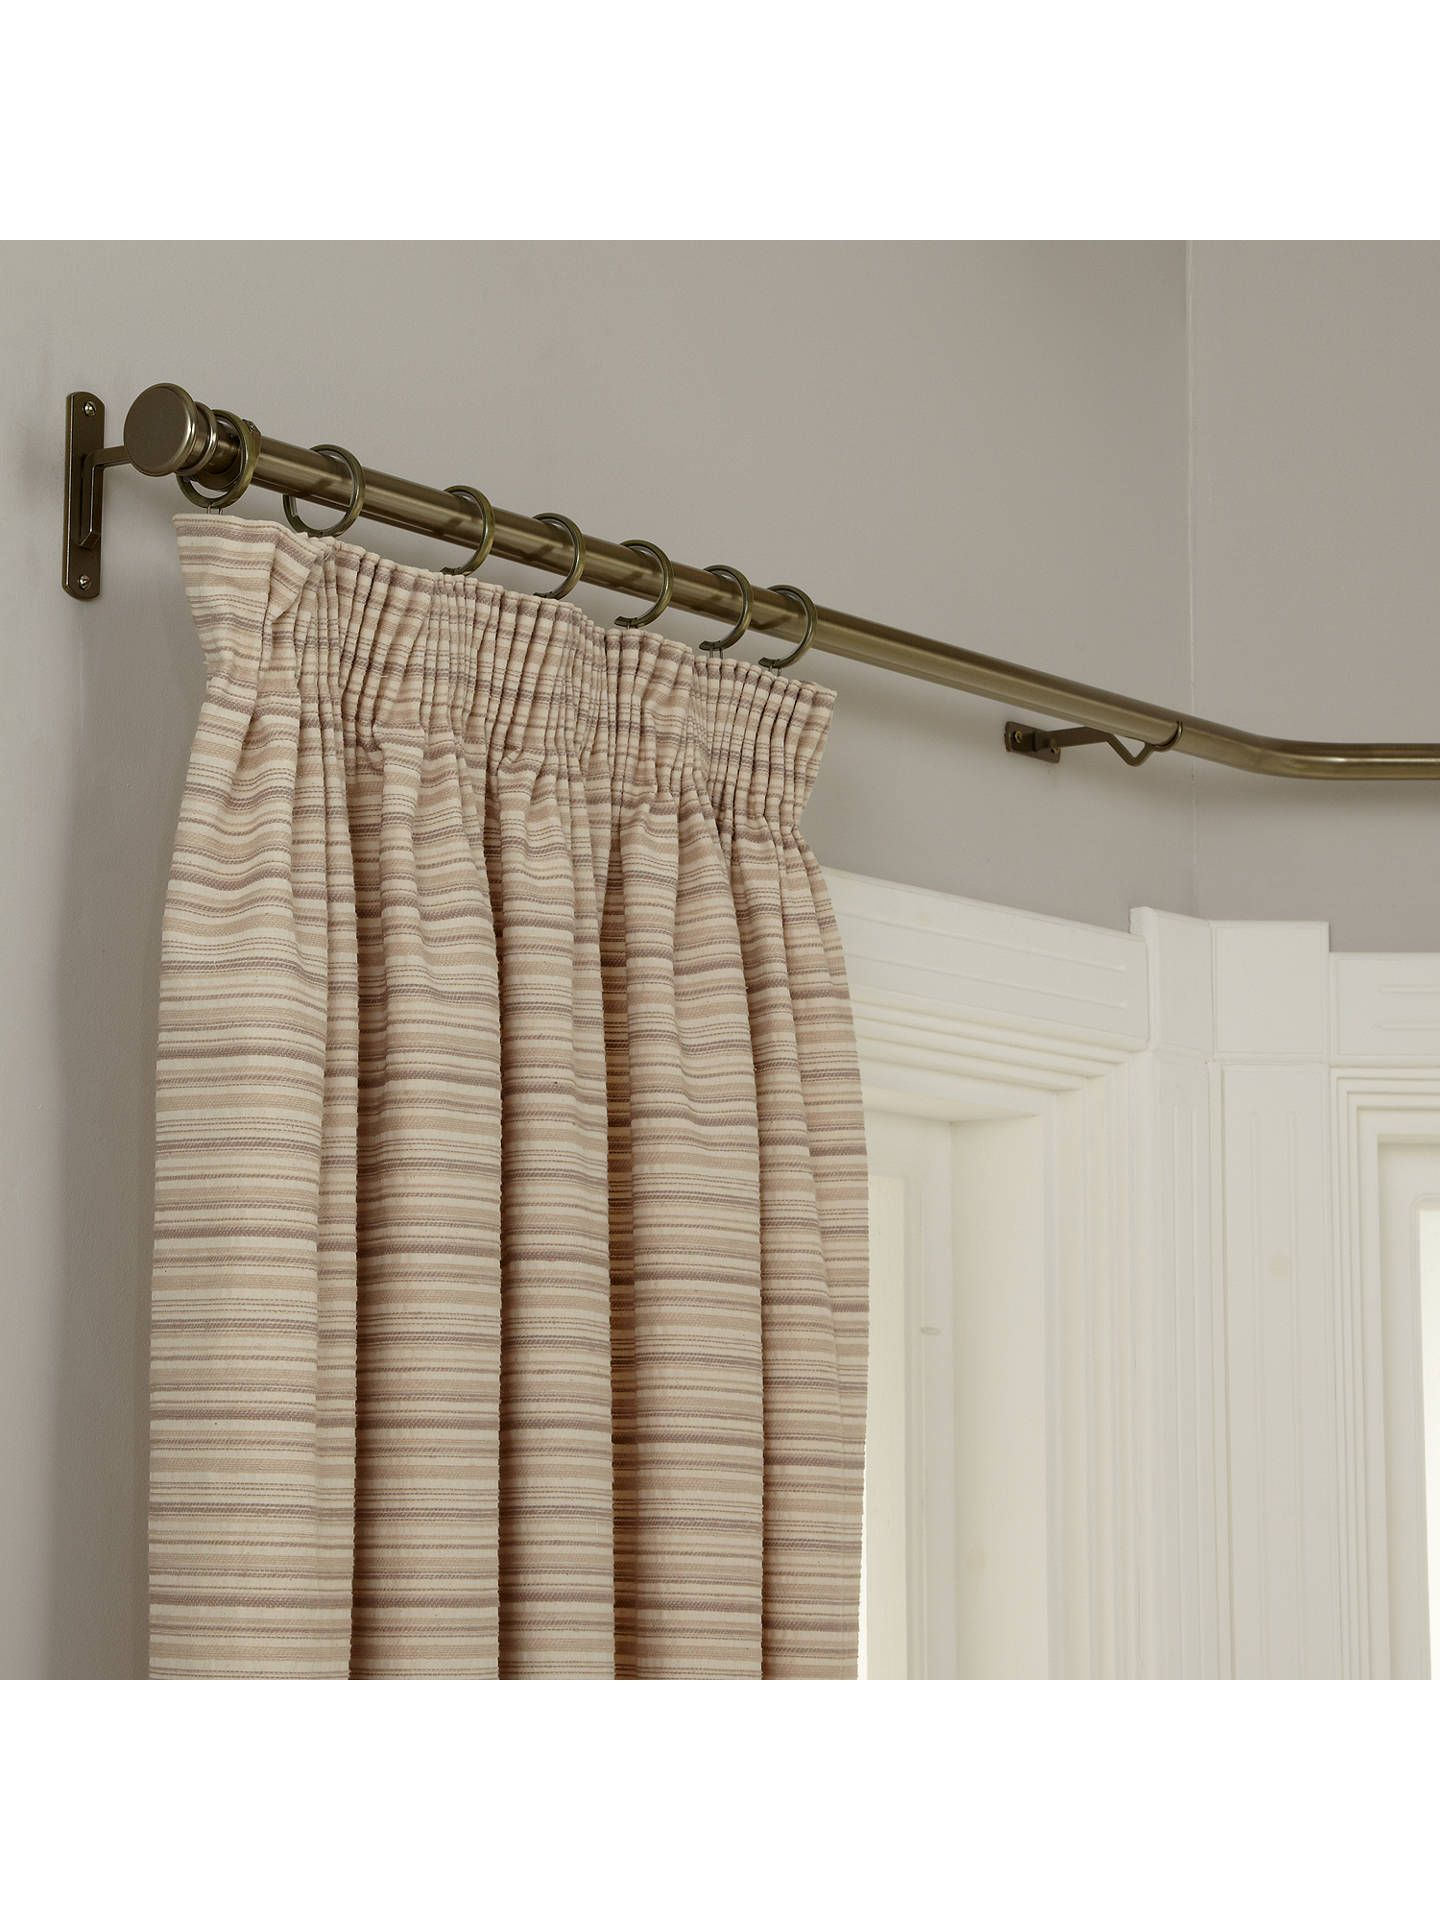 30 Fresh Bay Window Curtain Pole Wooden In 2020 Curtain Poles